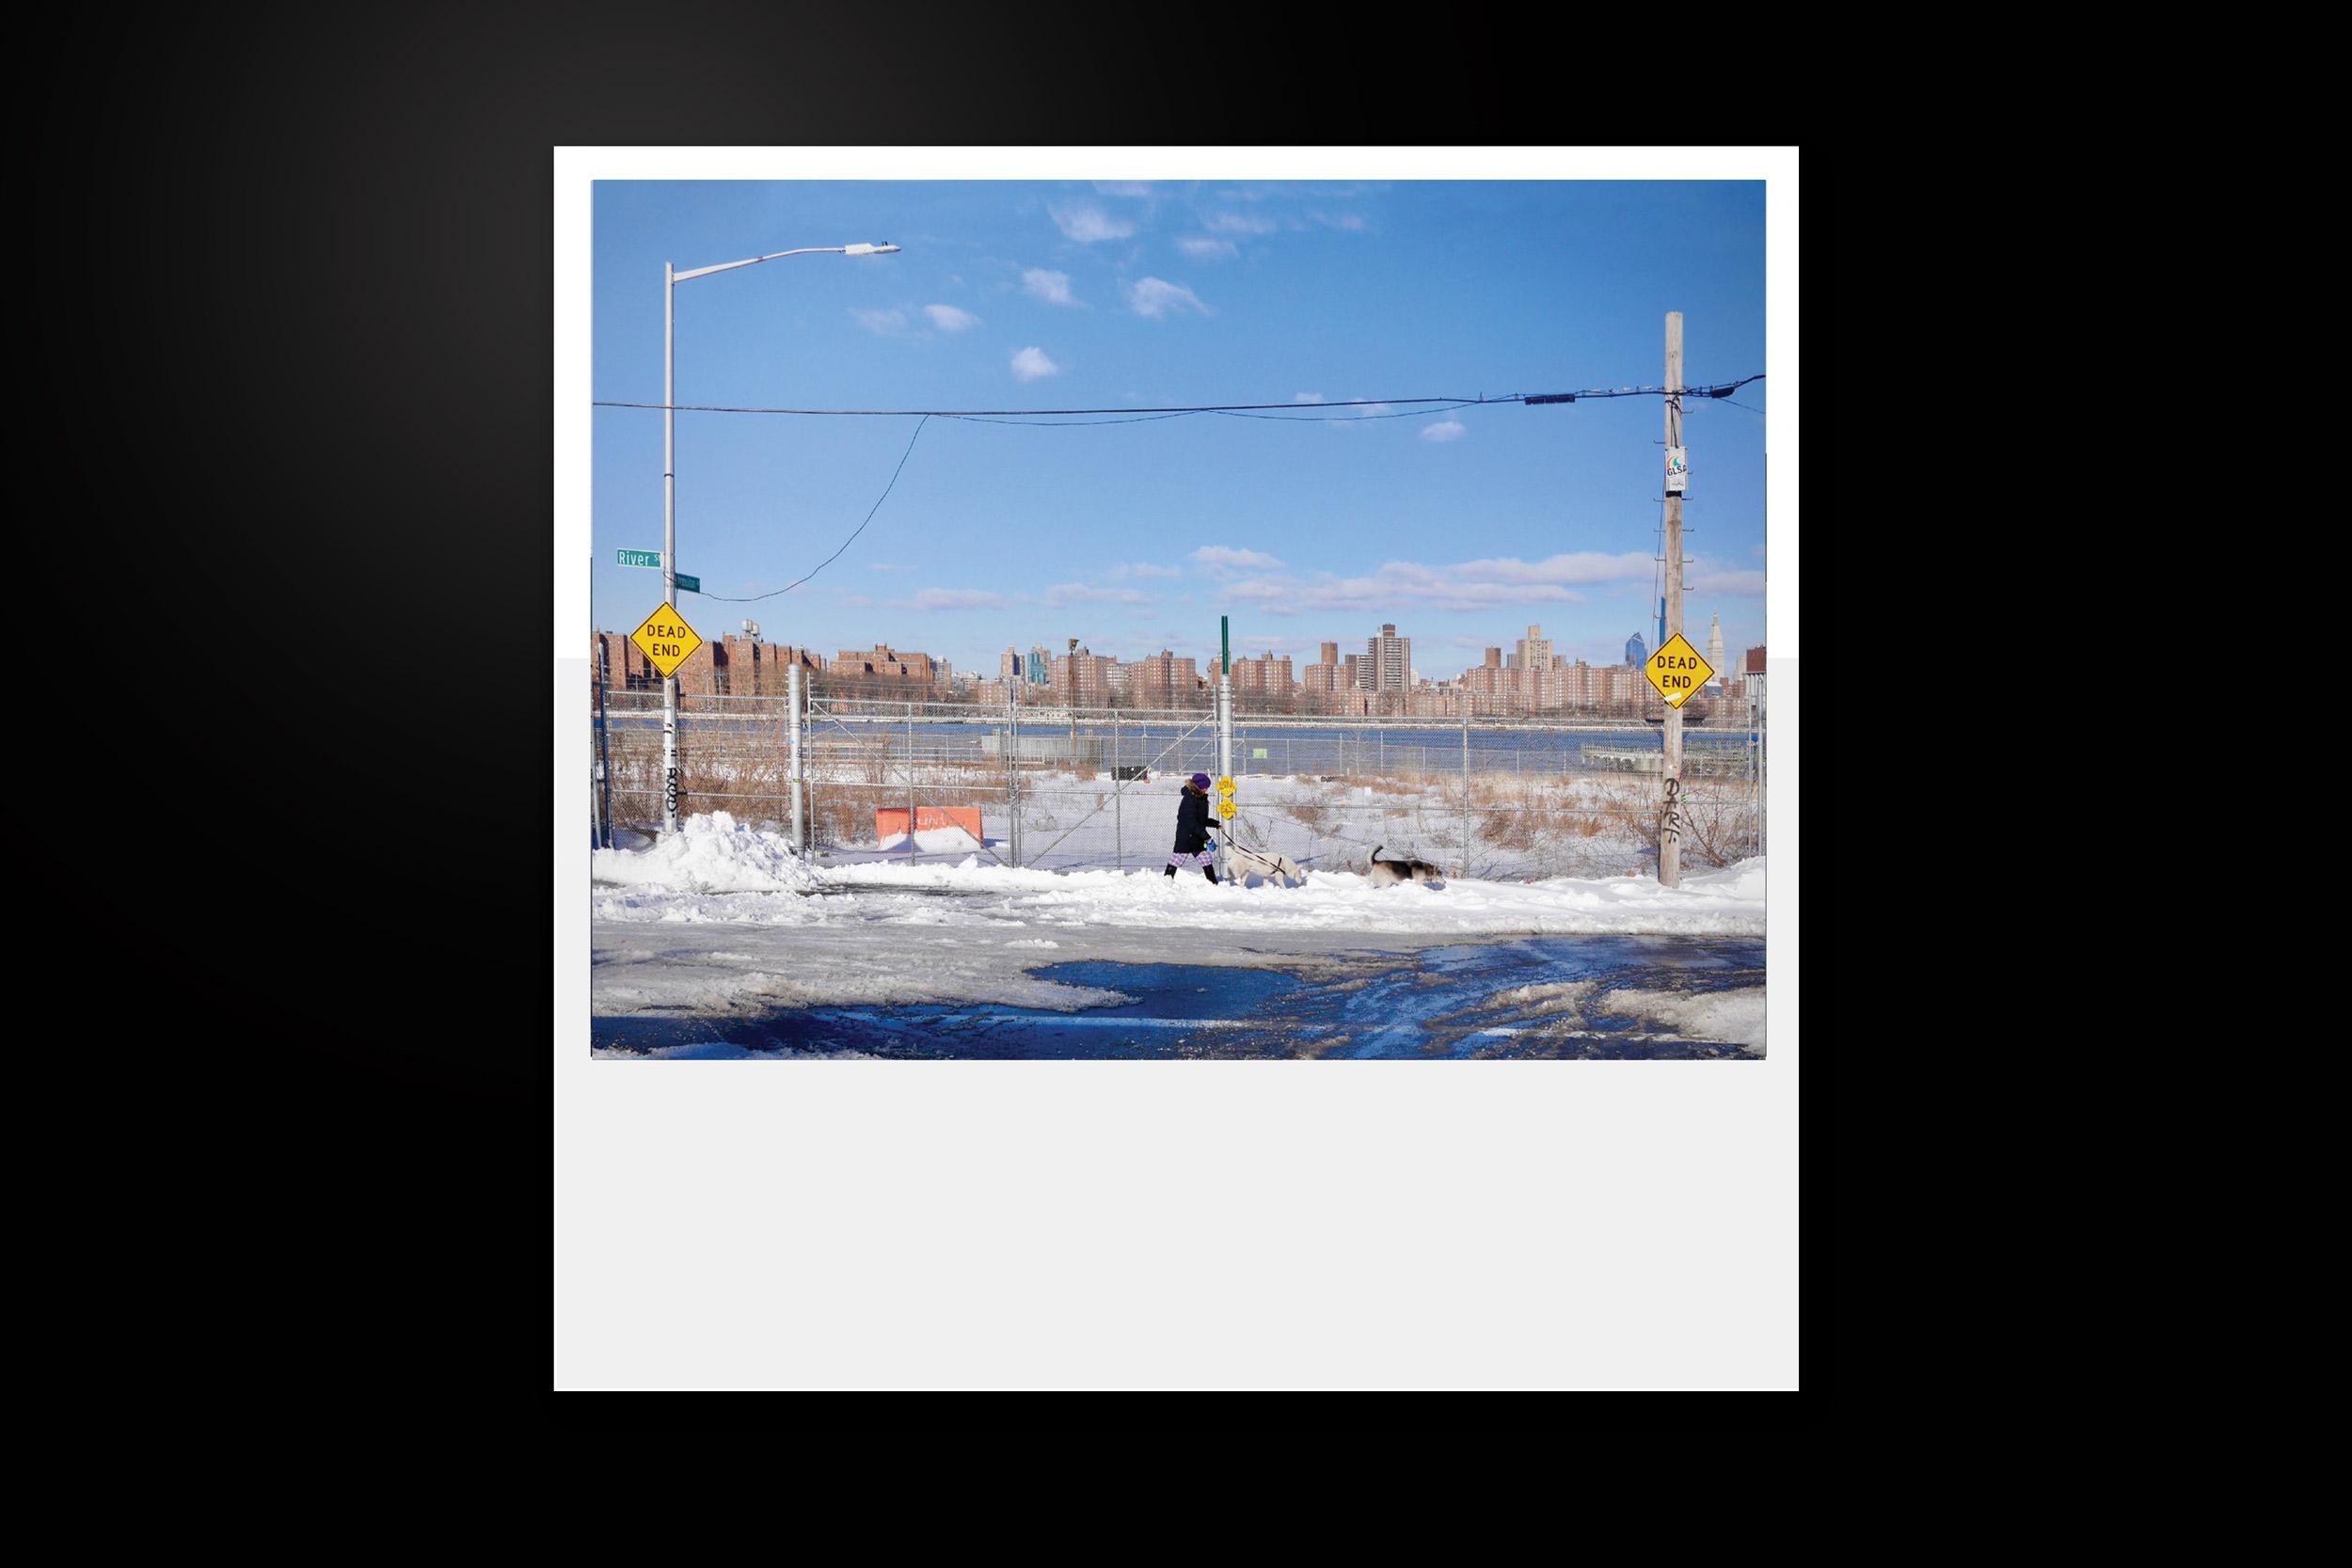 M336 ® Steven Paters - River Street